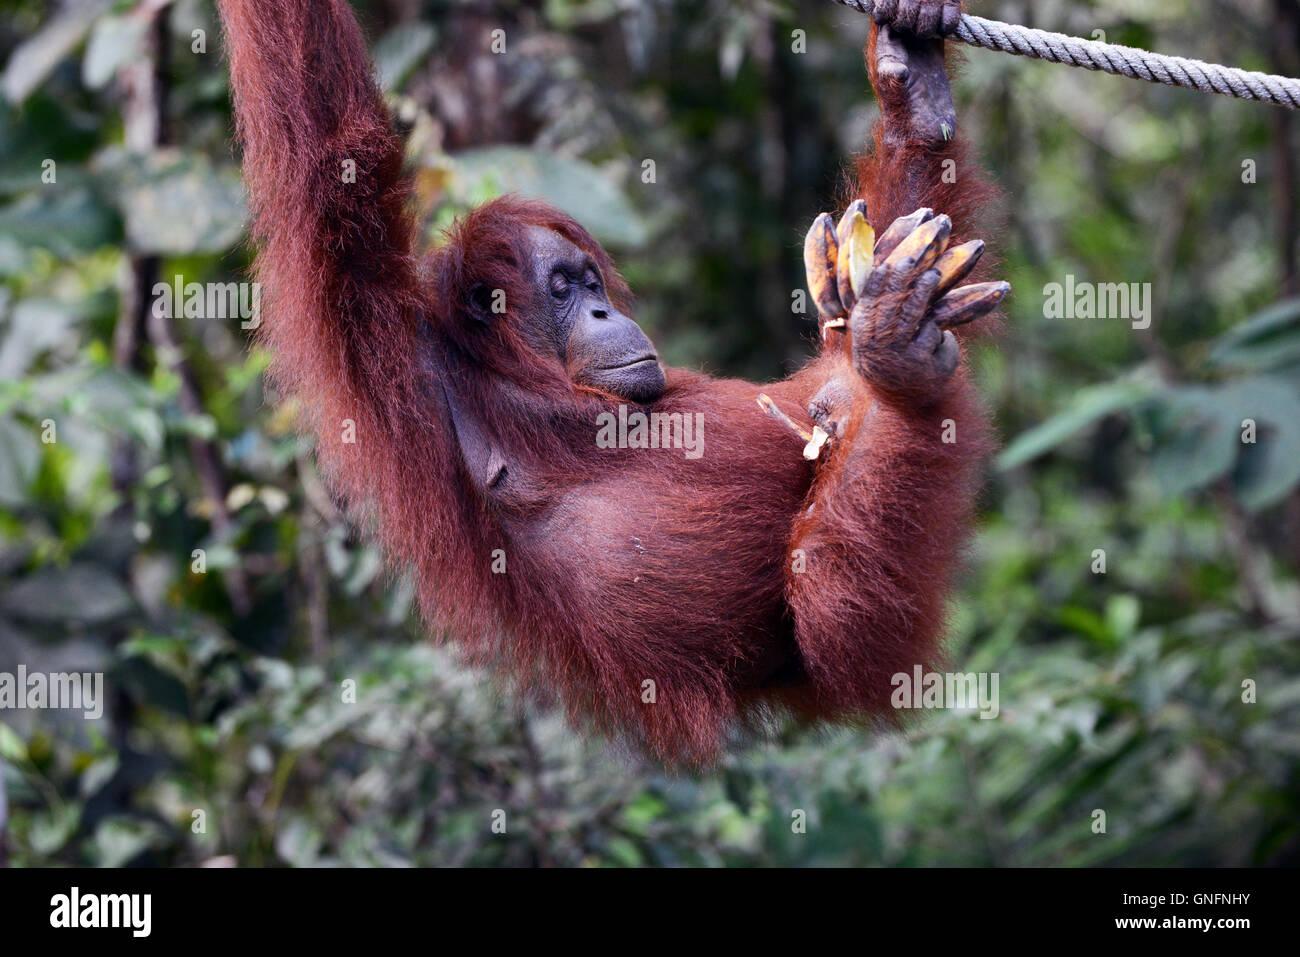 Feeding the Semi-wild Orangutans at the Semenggoh rehabilitation center near Kuching, Sarawak. - Stock Image